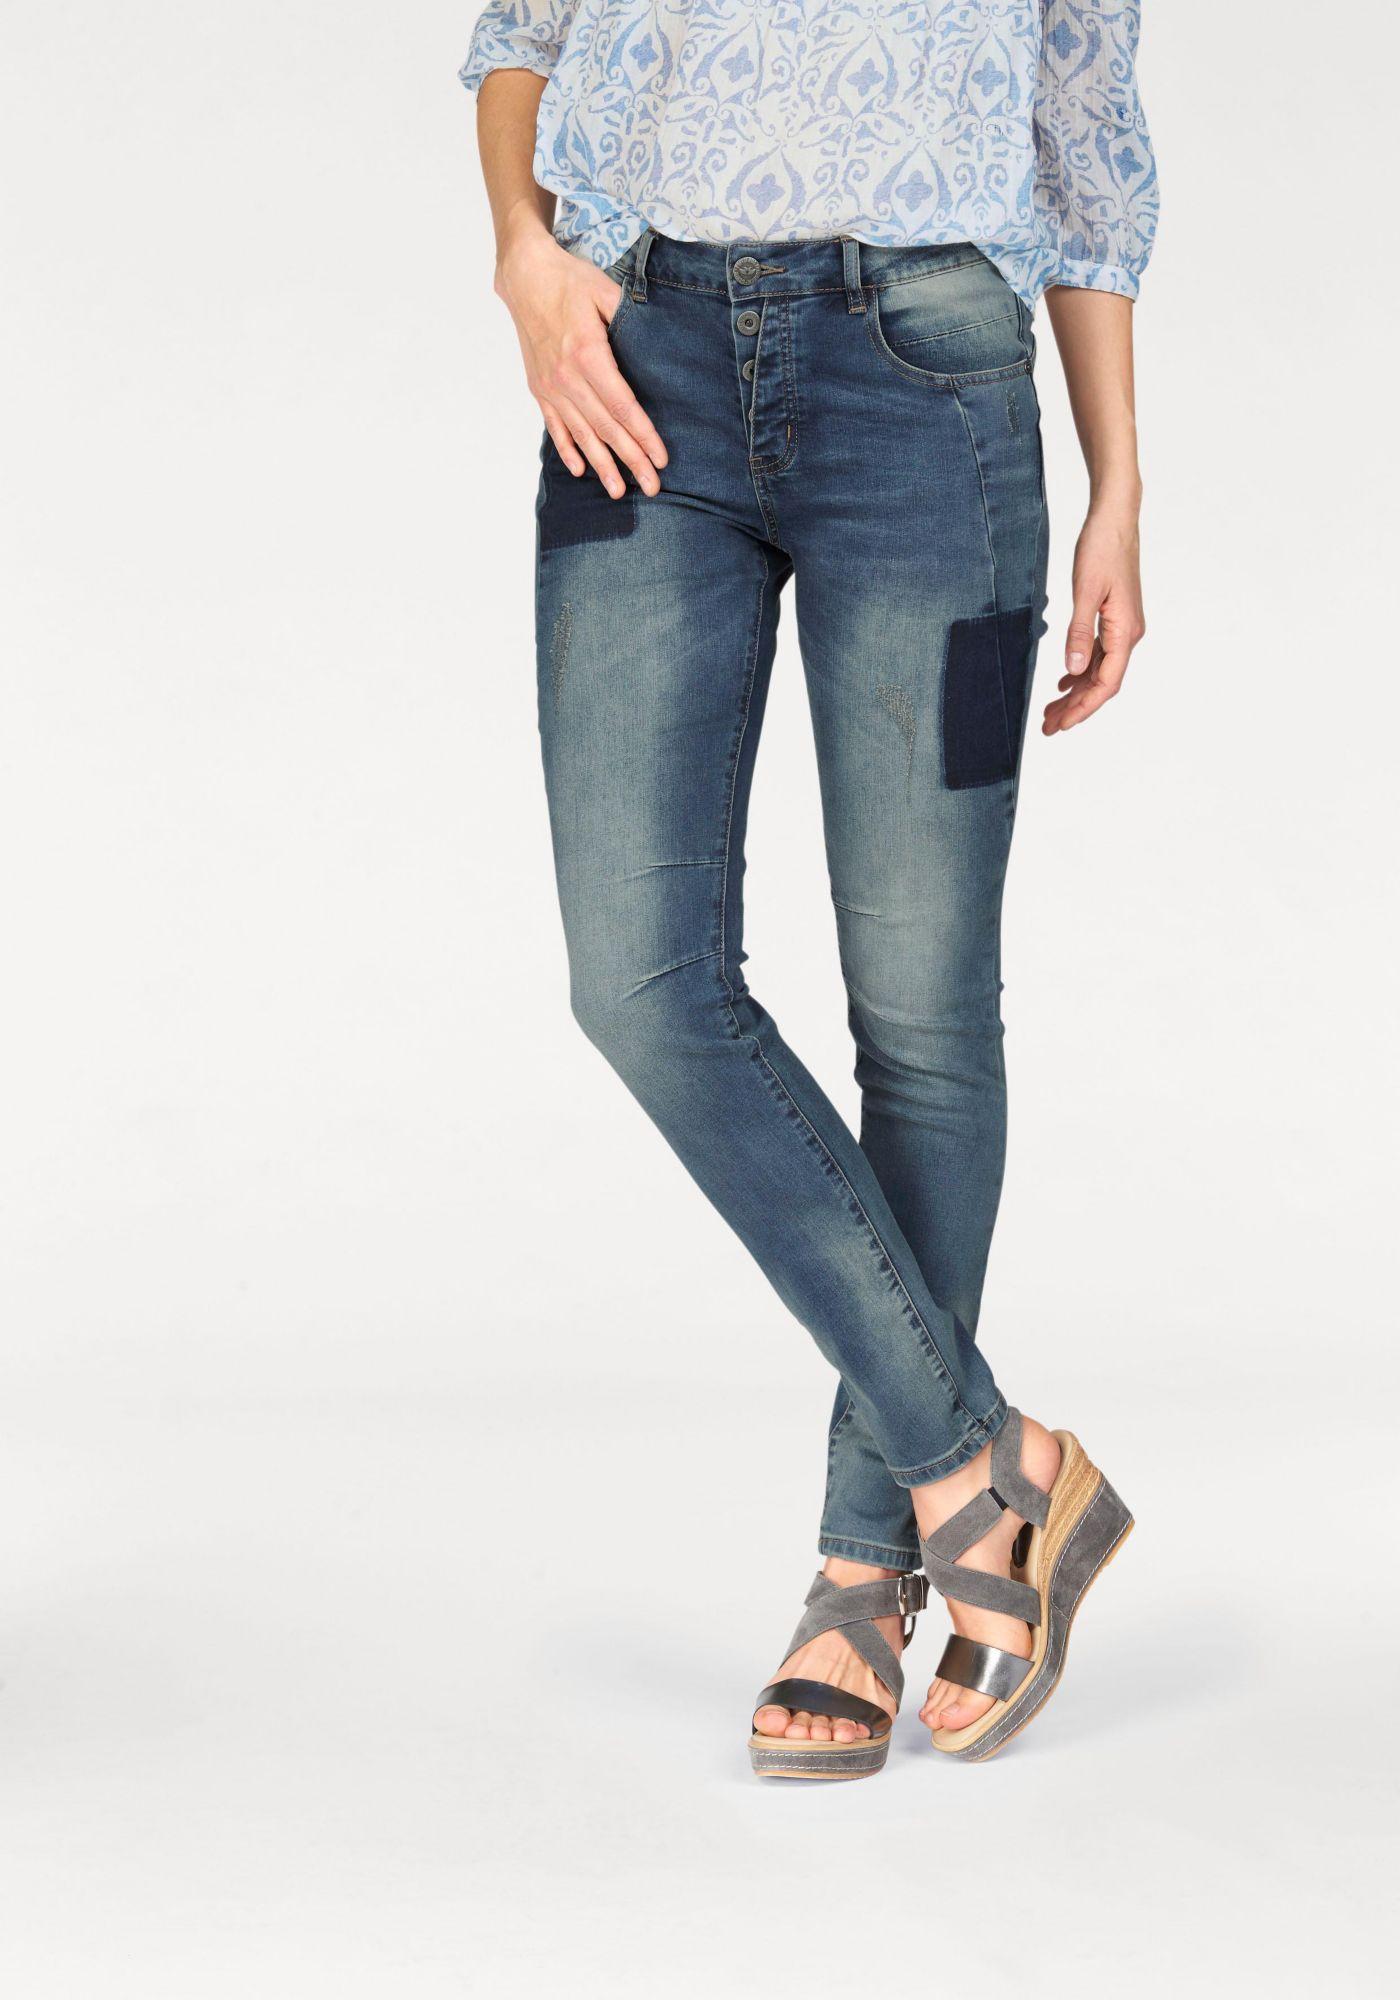 FRITZI AUS PREUßEN Fritzi aus Preußen Boyfriend-Jeans »OHIO«